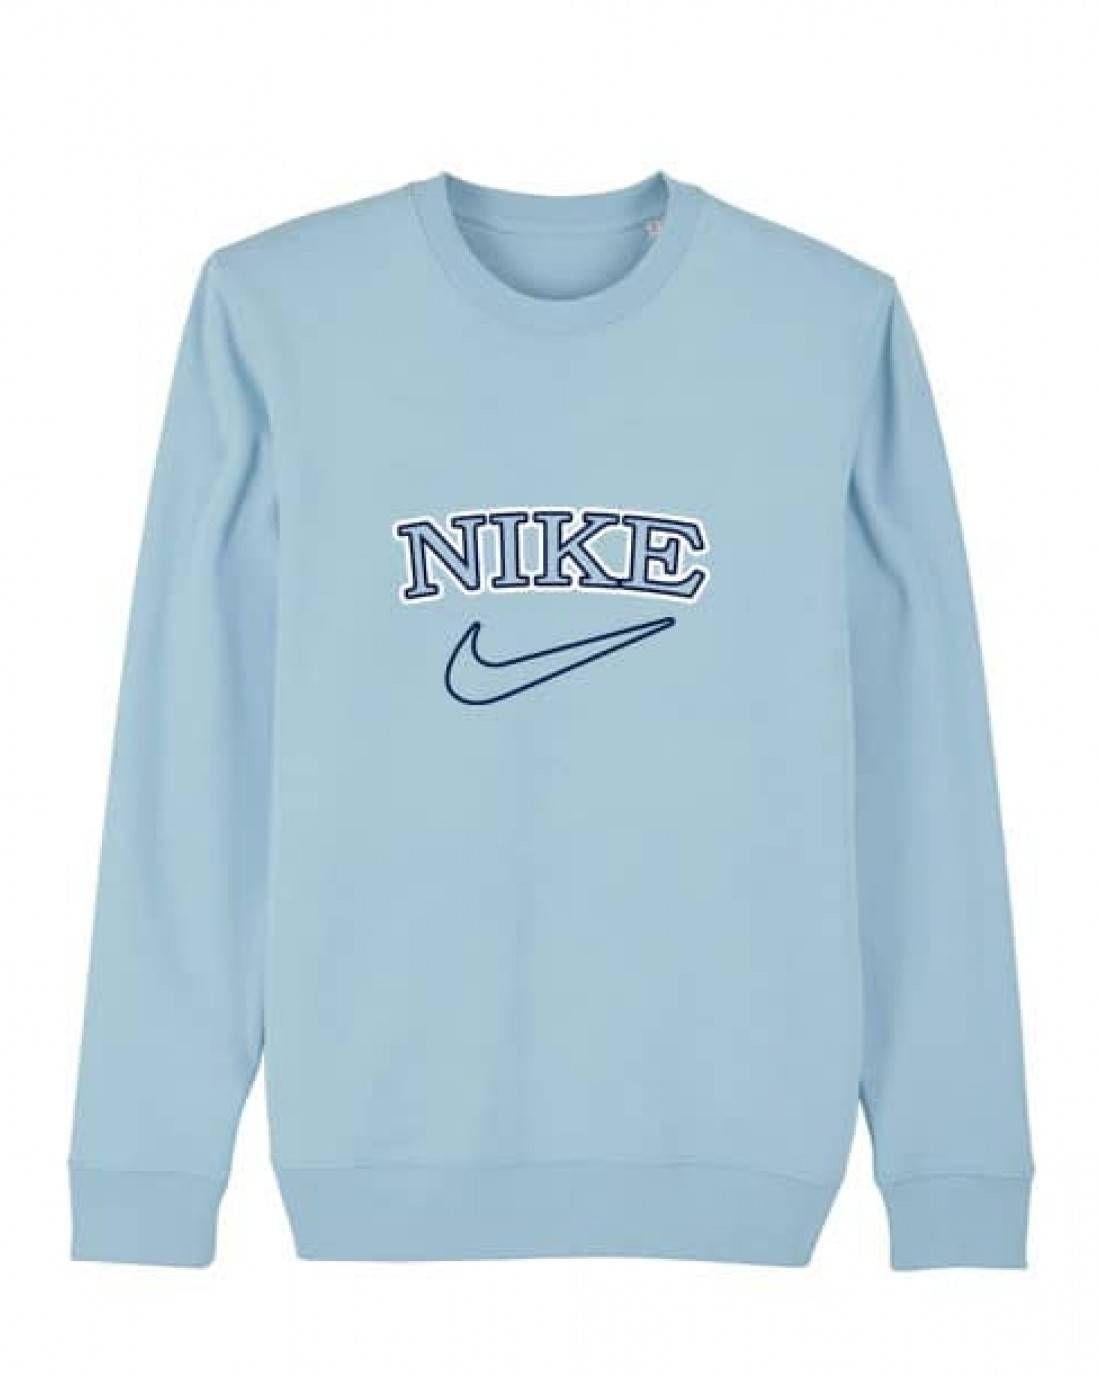 Vintage Tick Womens Sweater Vintage Nike Sweatshirt Baby Blue Shirt Sweaters For Women [ 1376 x 1100 Pixel ]